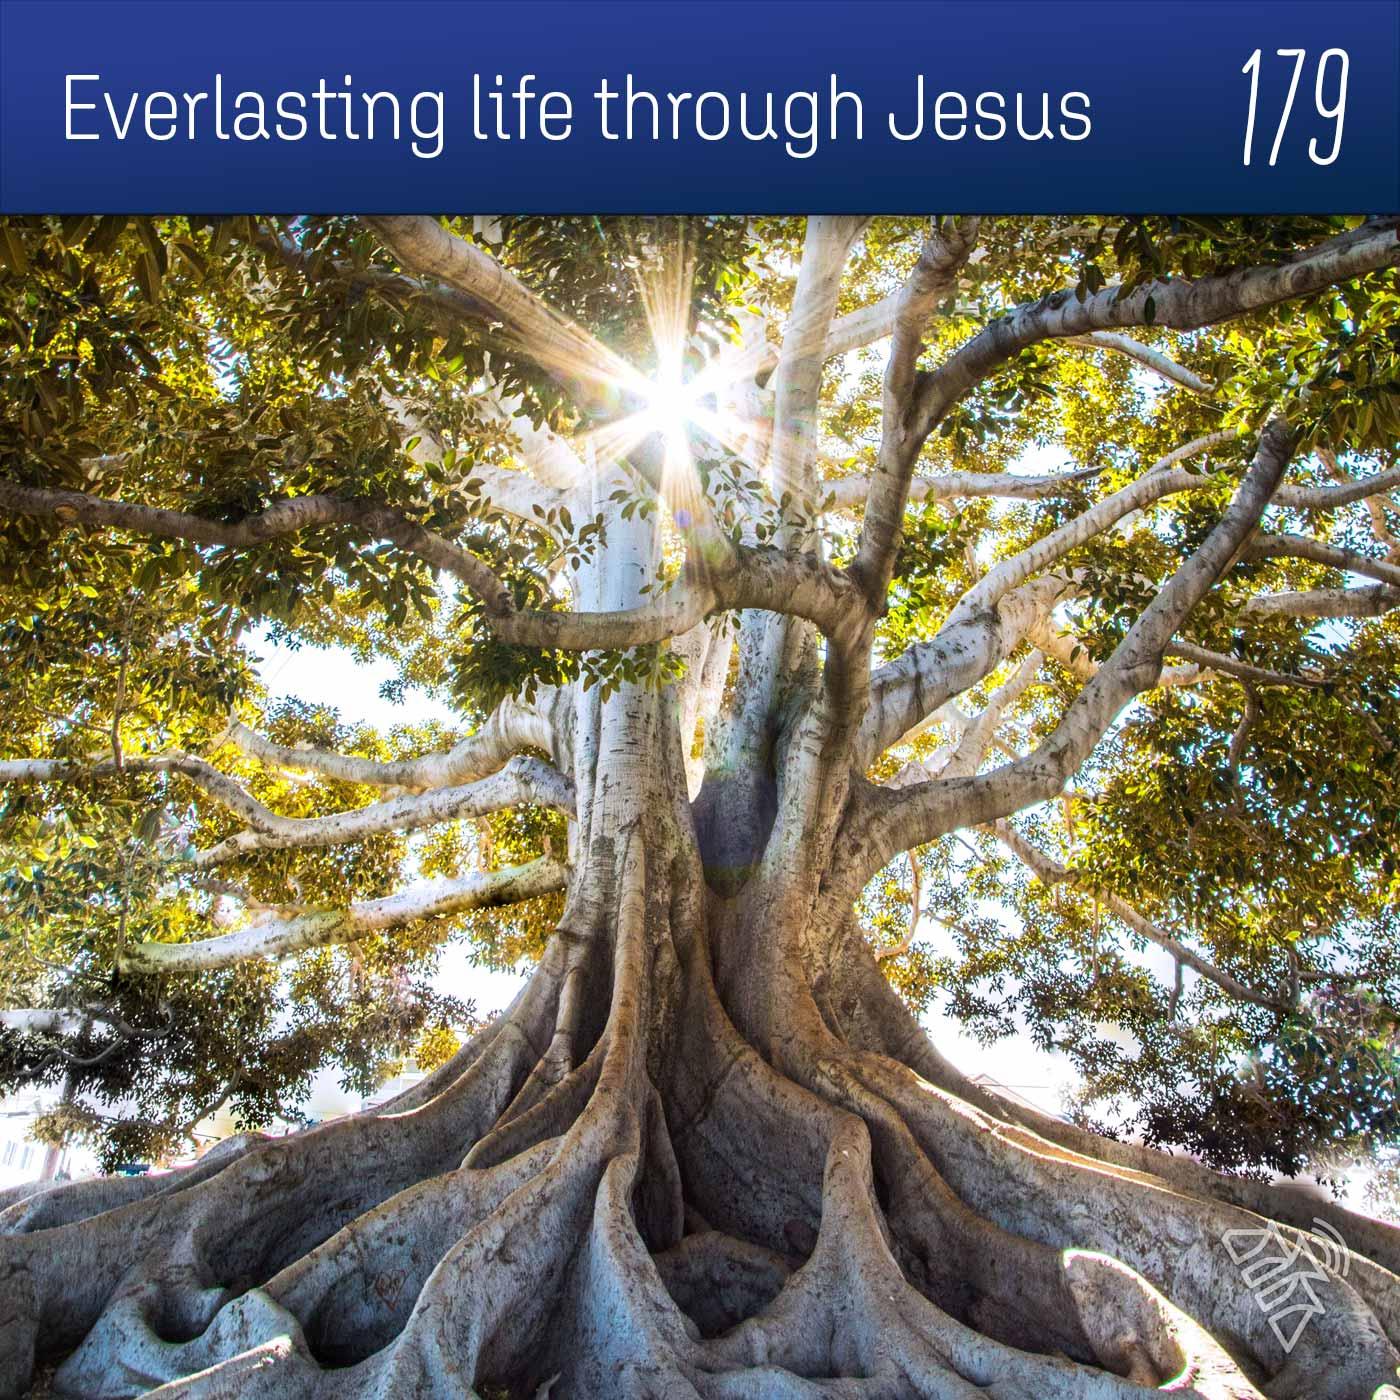 Everlasting life through Jesus